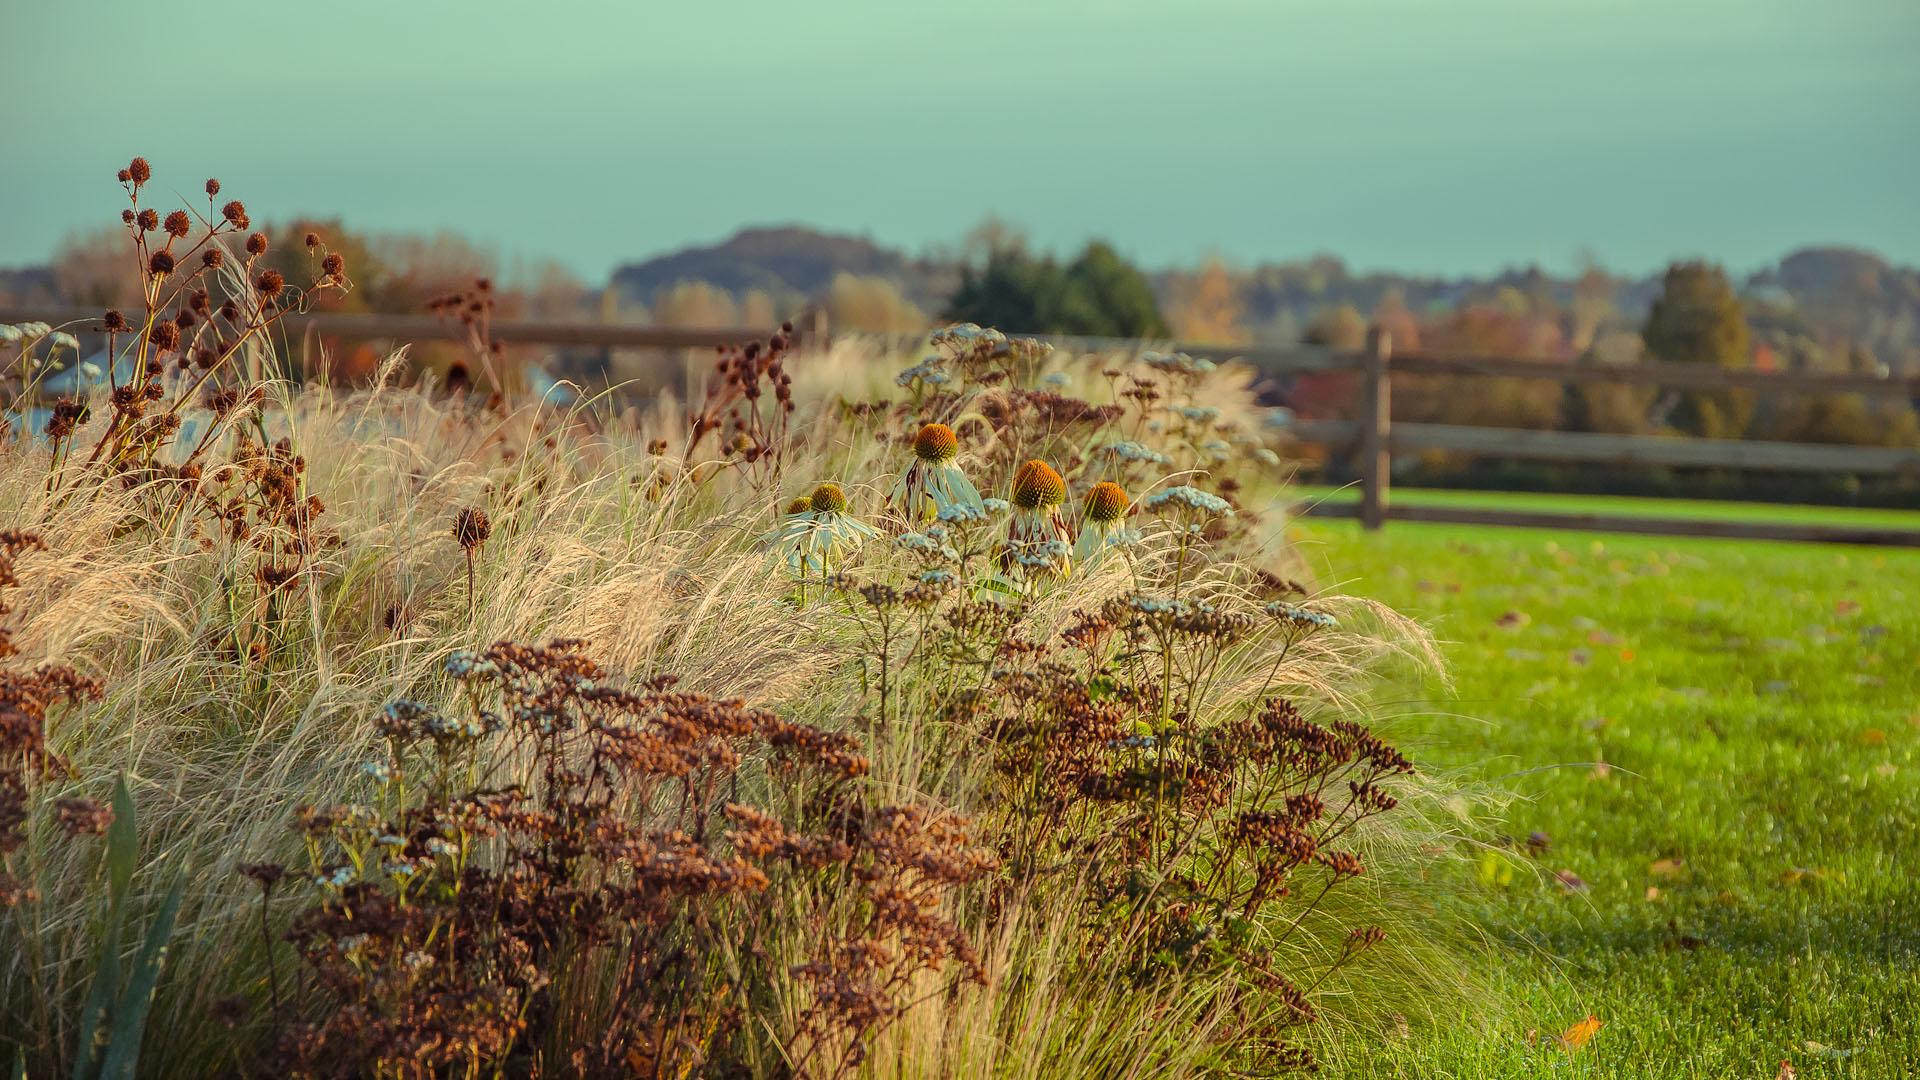 herfstkleuren, grassenborder, terras, gazon